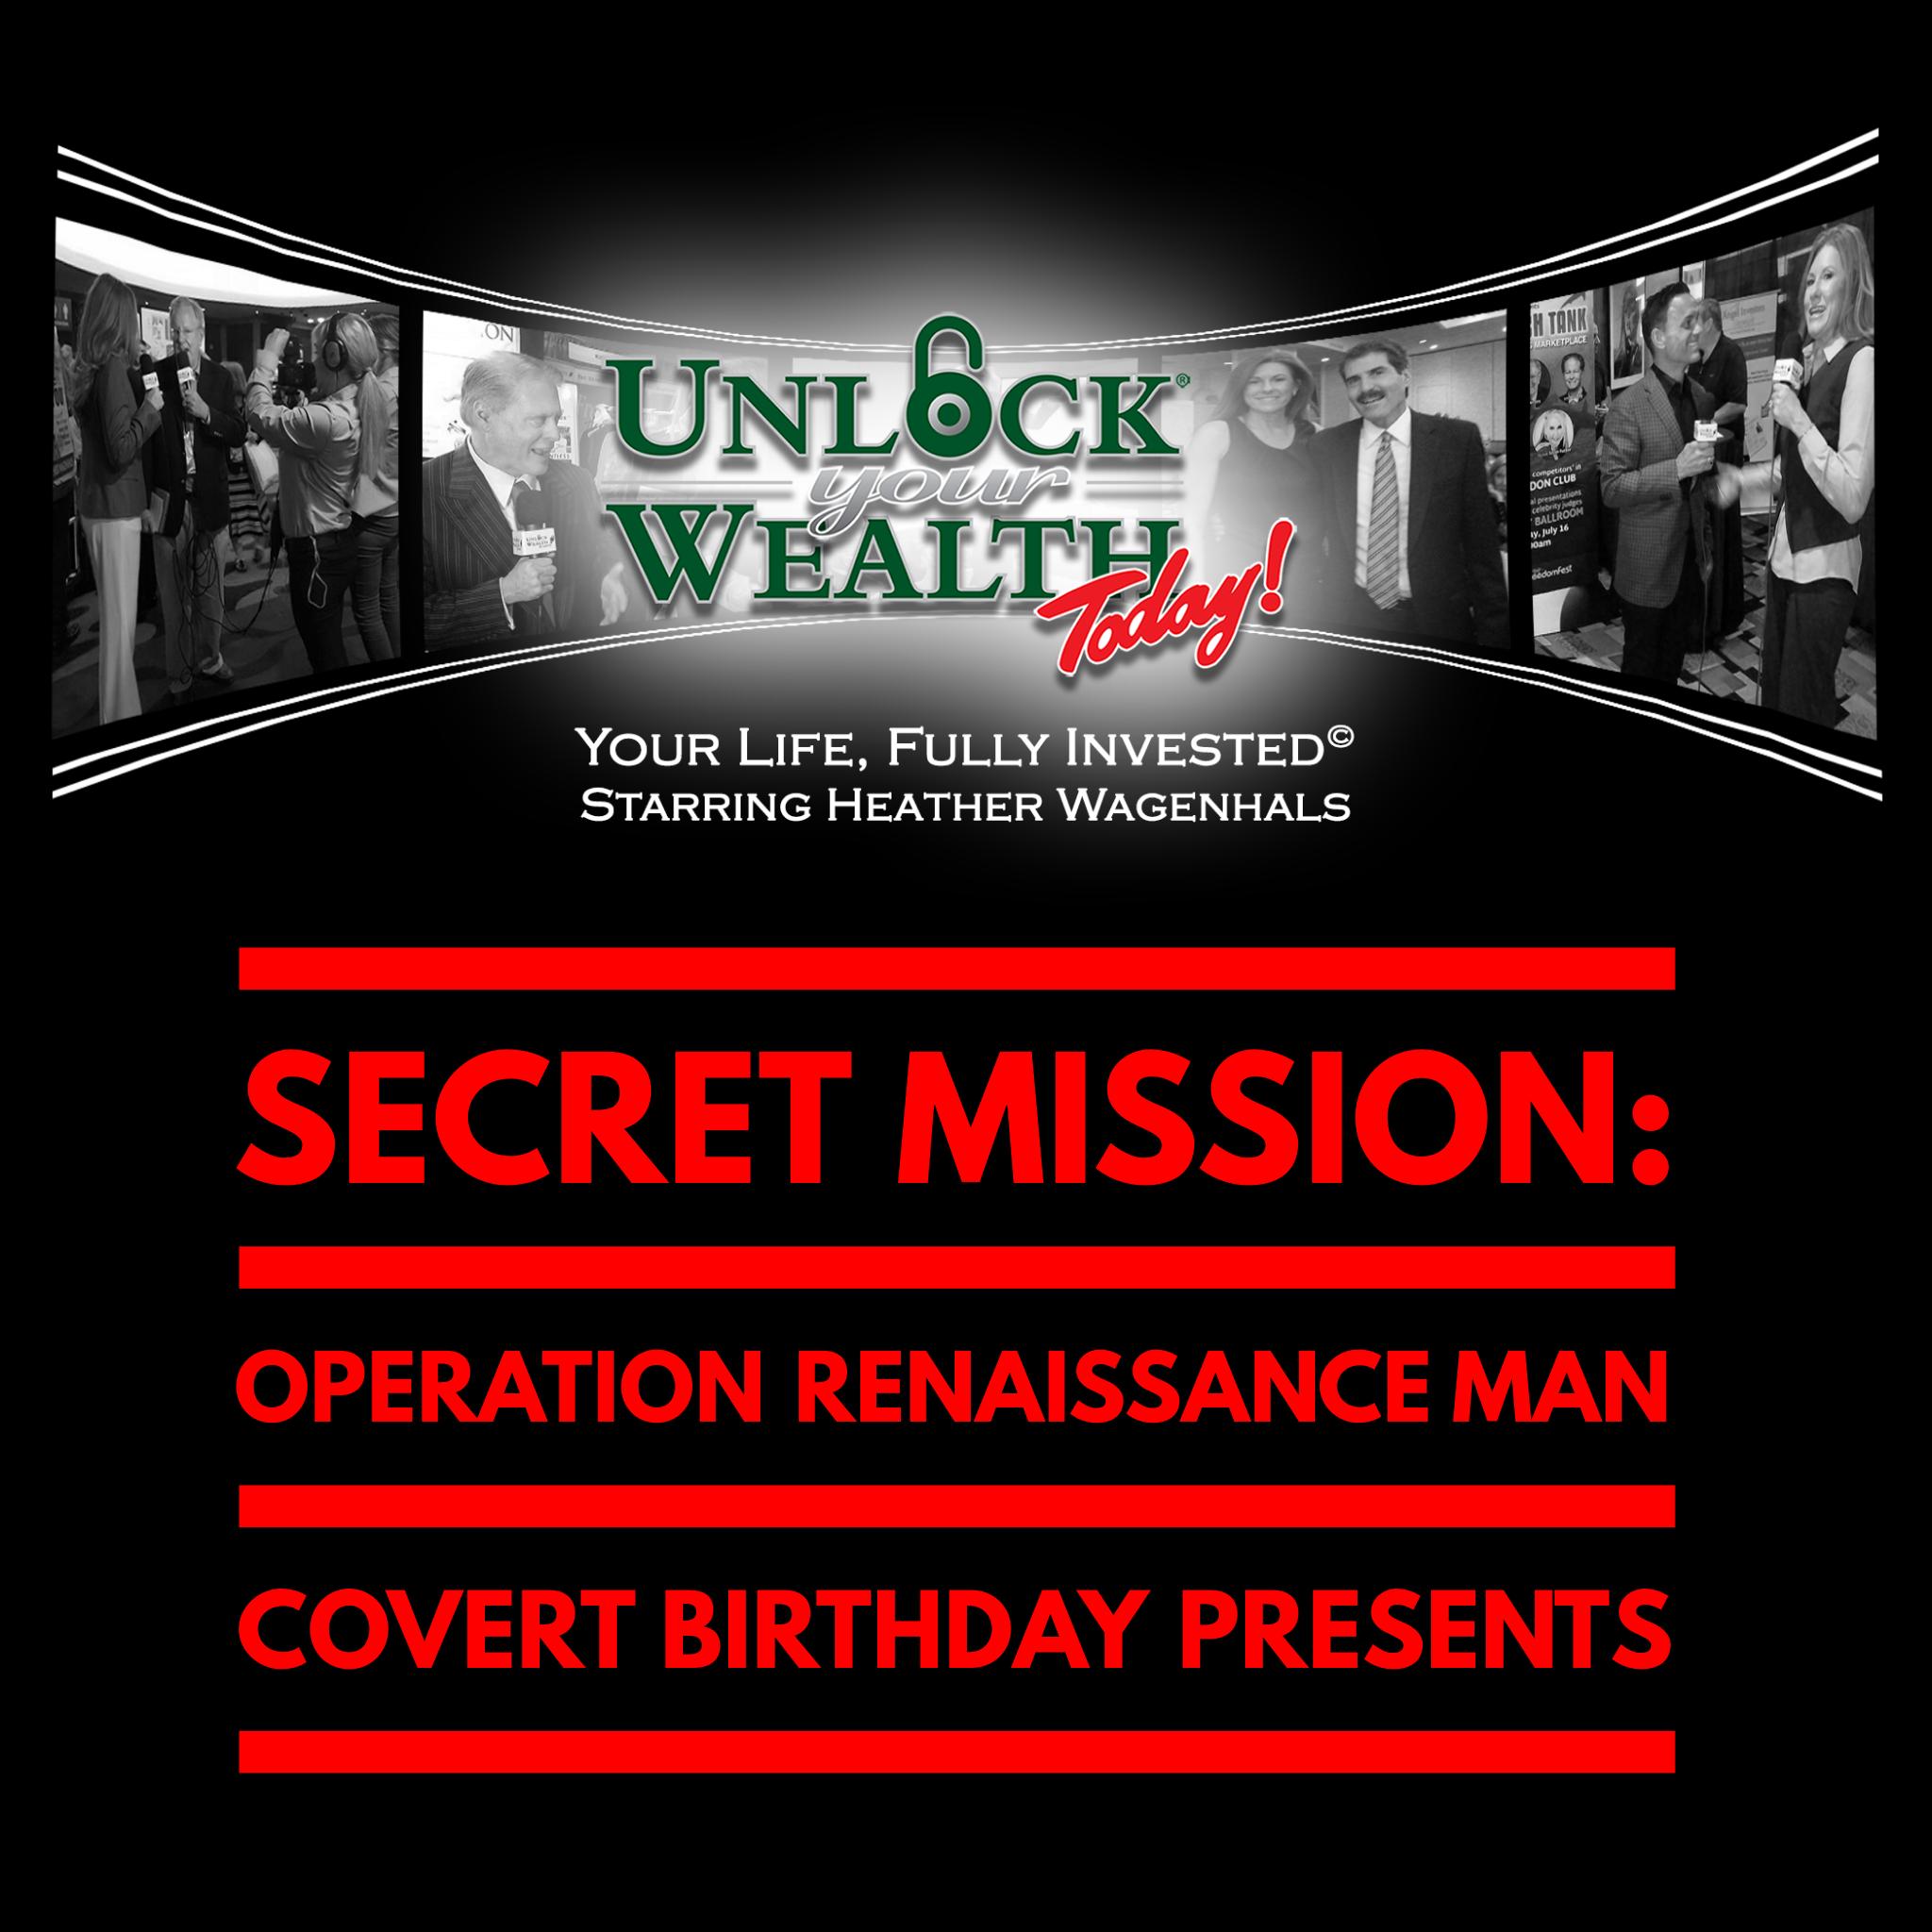 Artwork for Secret Missions, Renaissance Men, and Birthday Giveaways